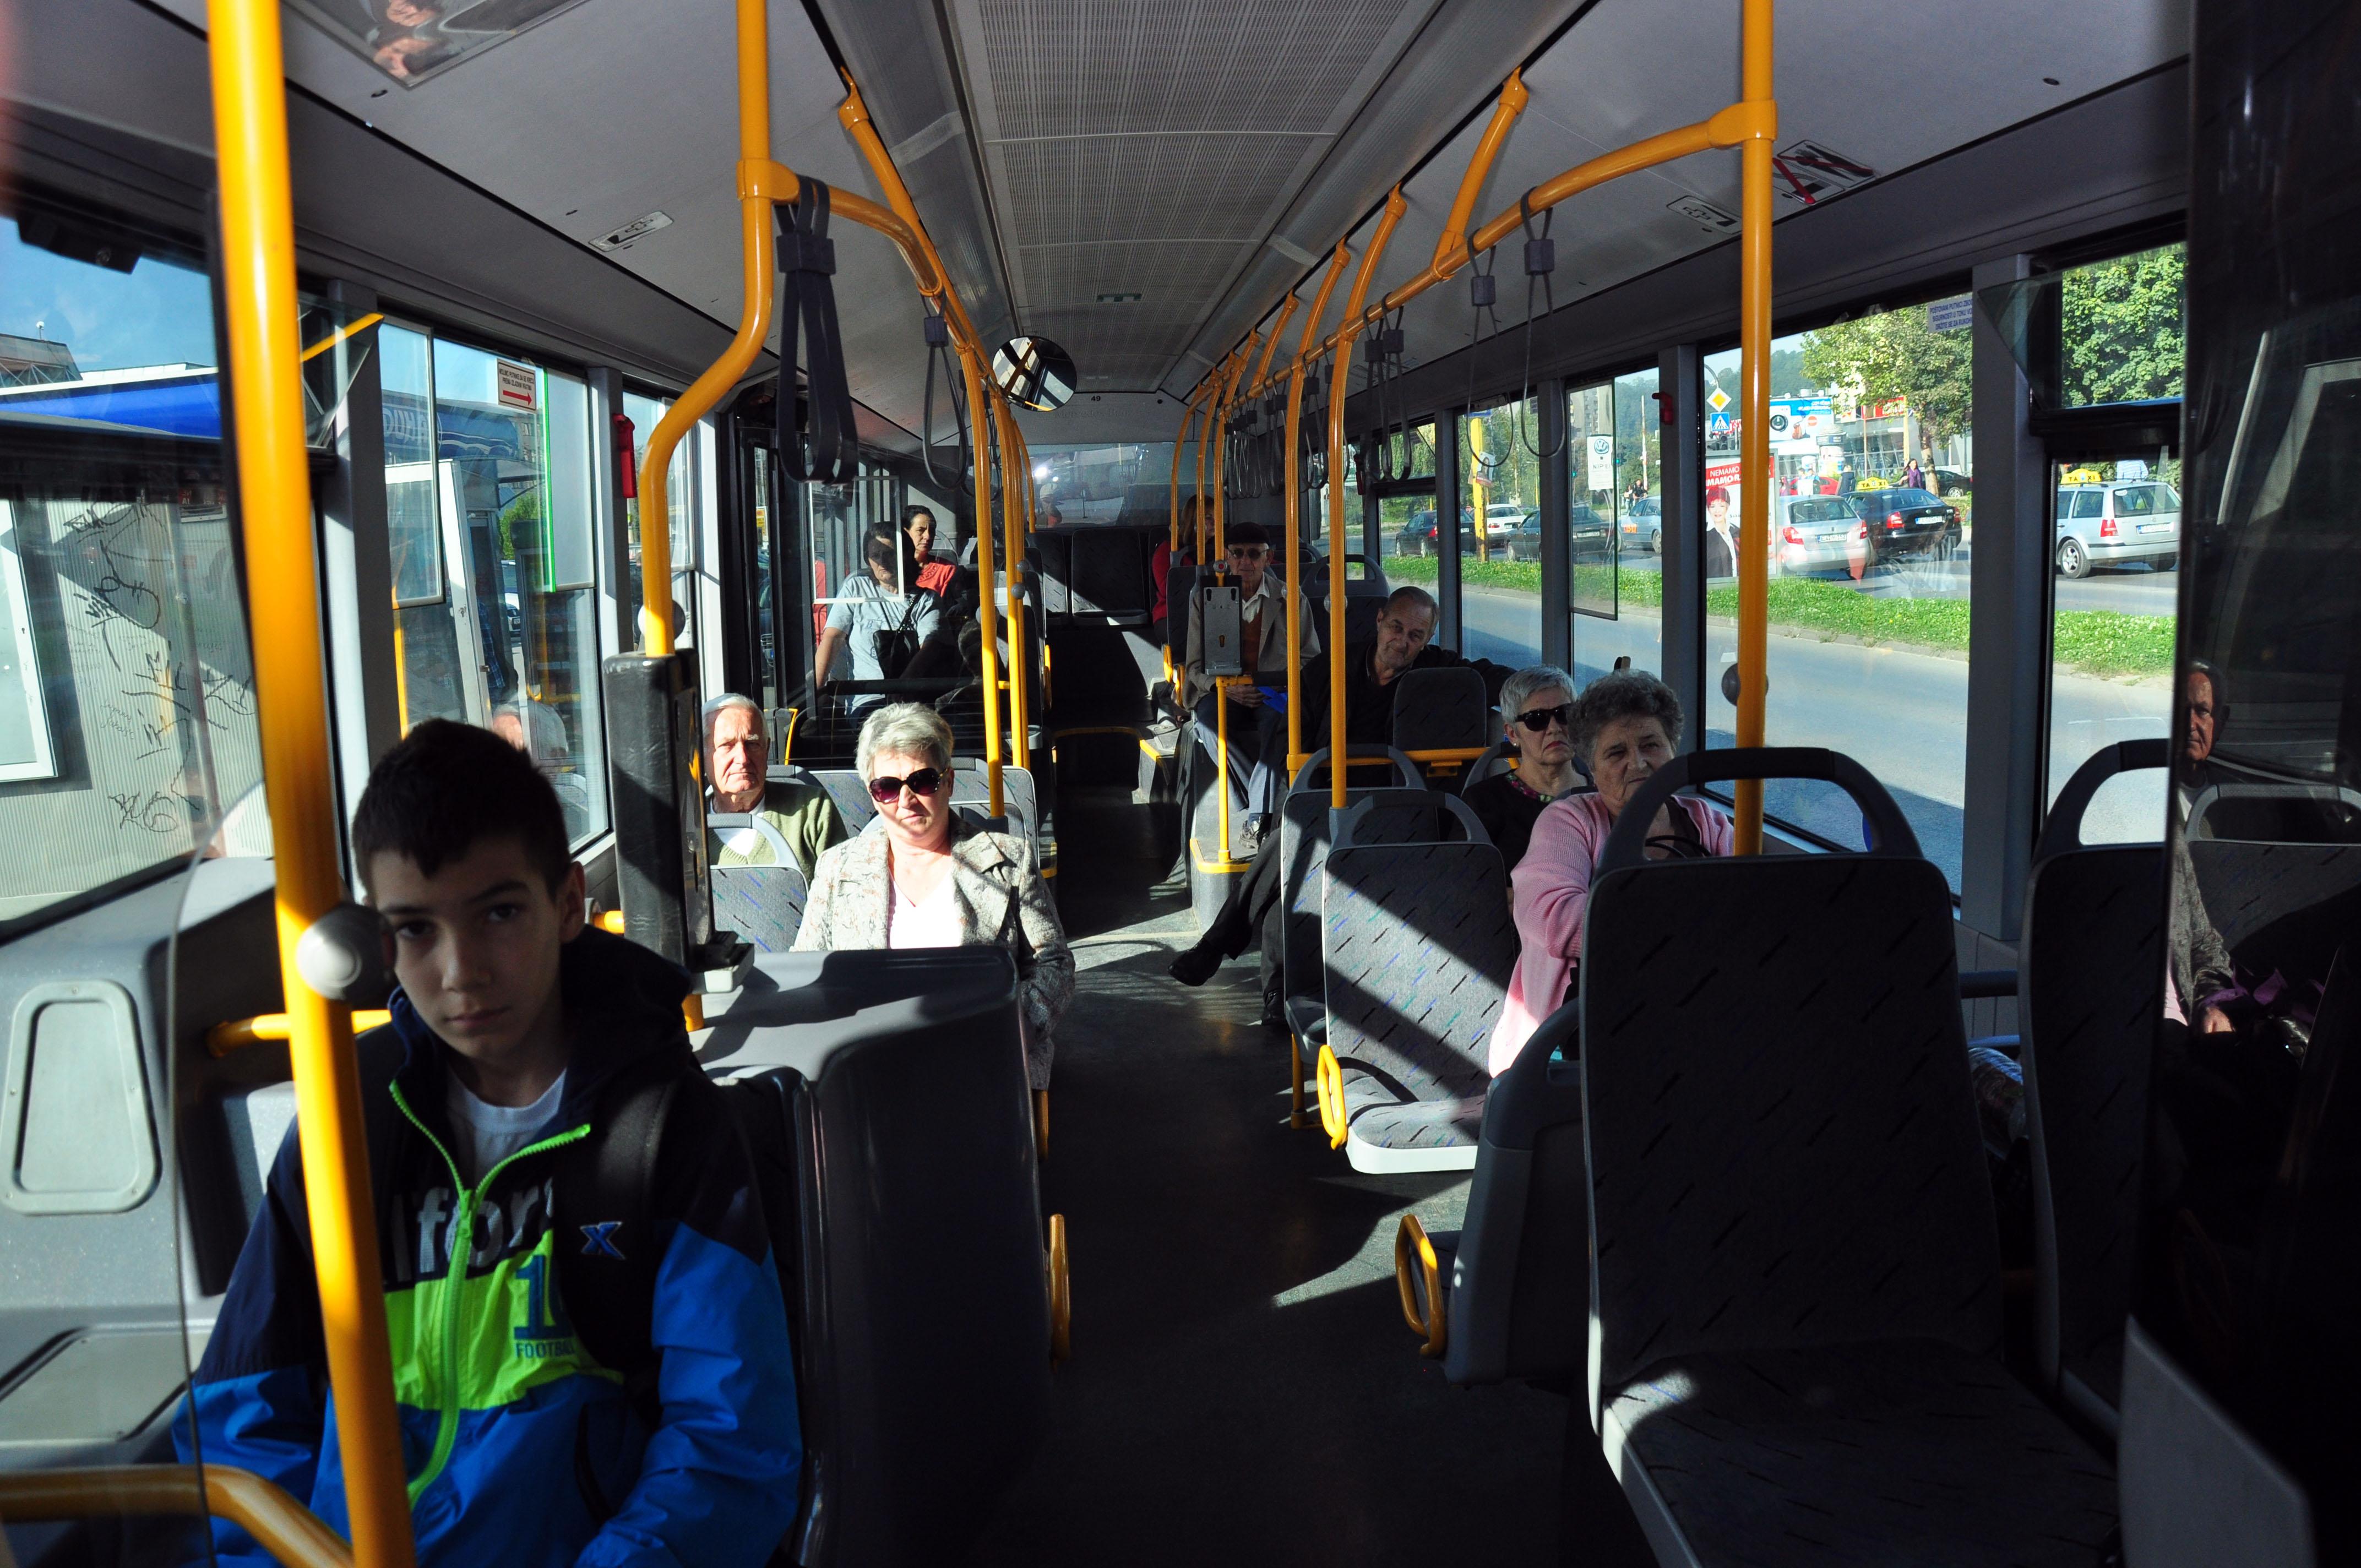 https://www.gipstk.com/wp-content/uploads/2014/10/Autobus-0.jpg